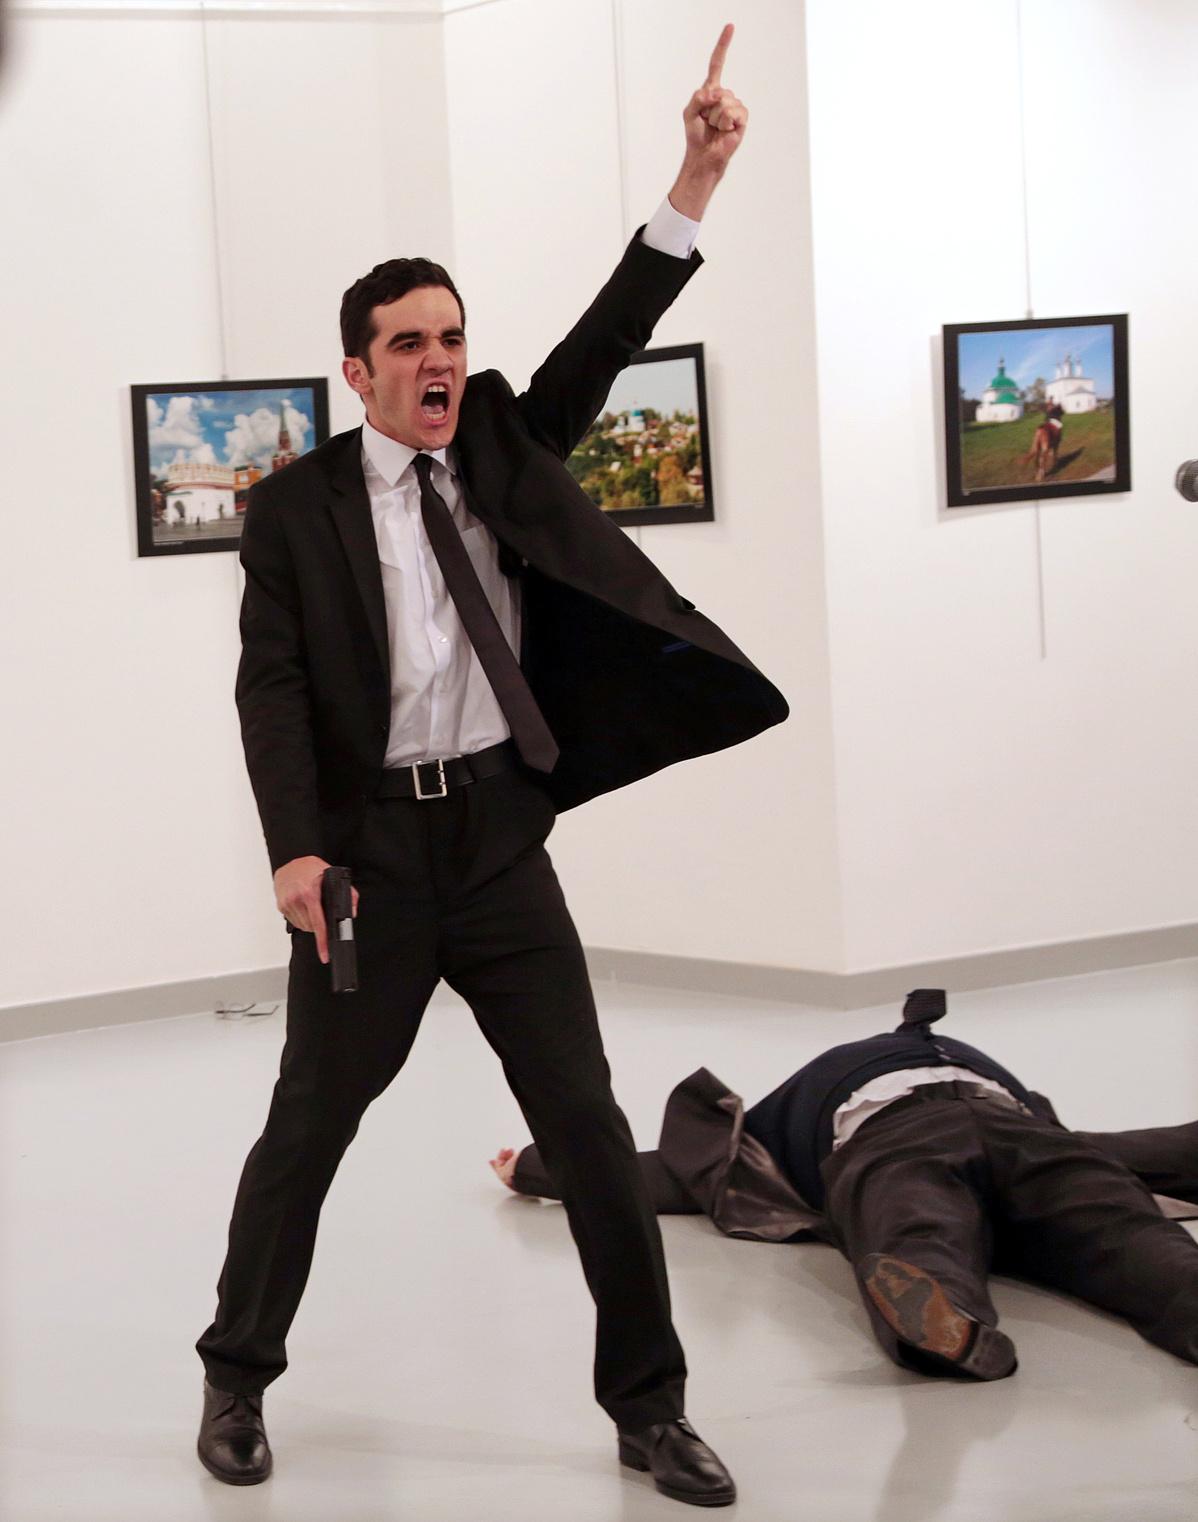 001 Burhan Ozbilici The Associated Press